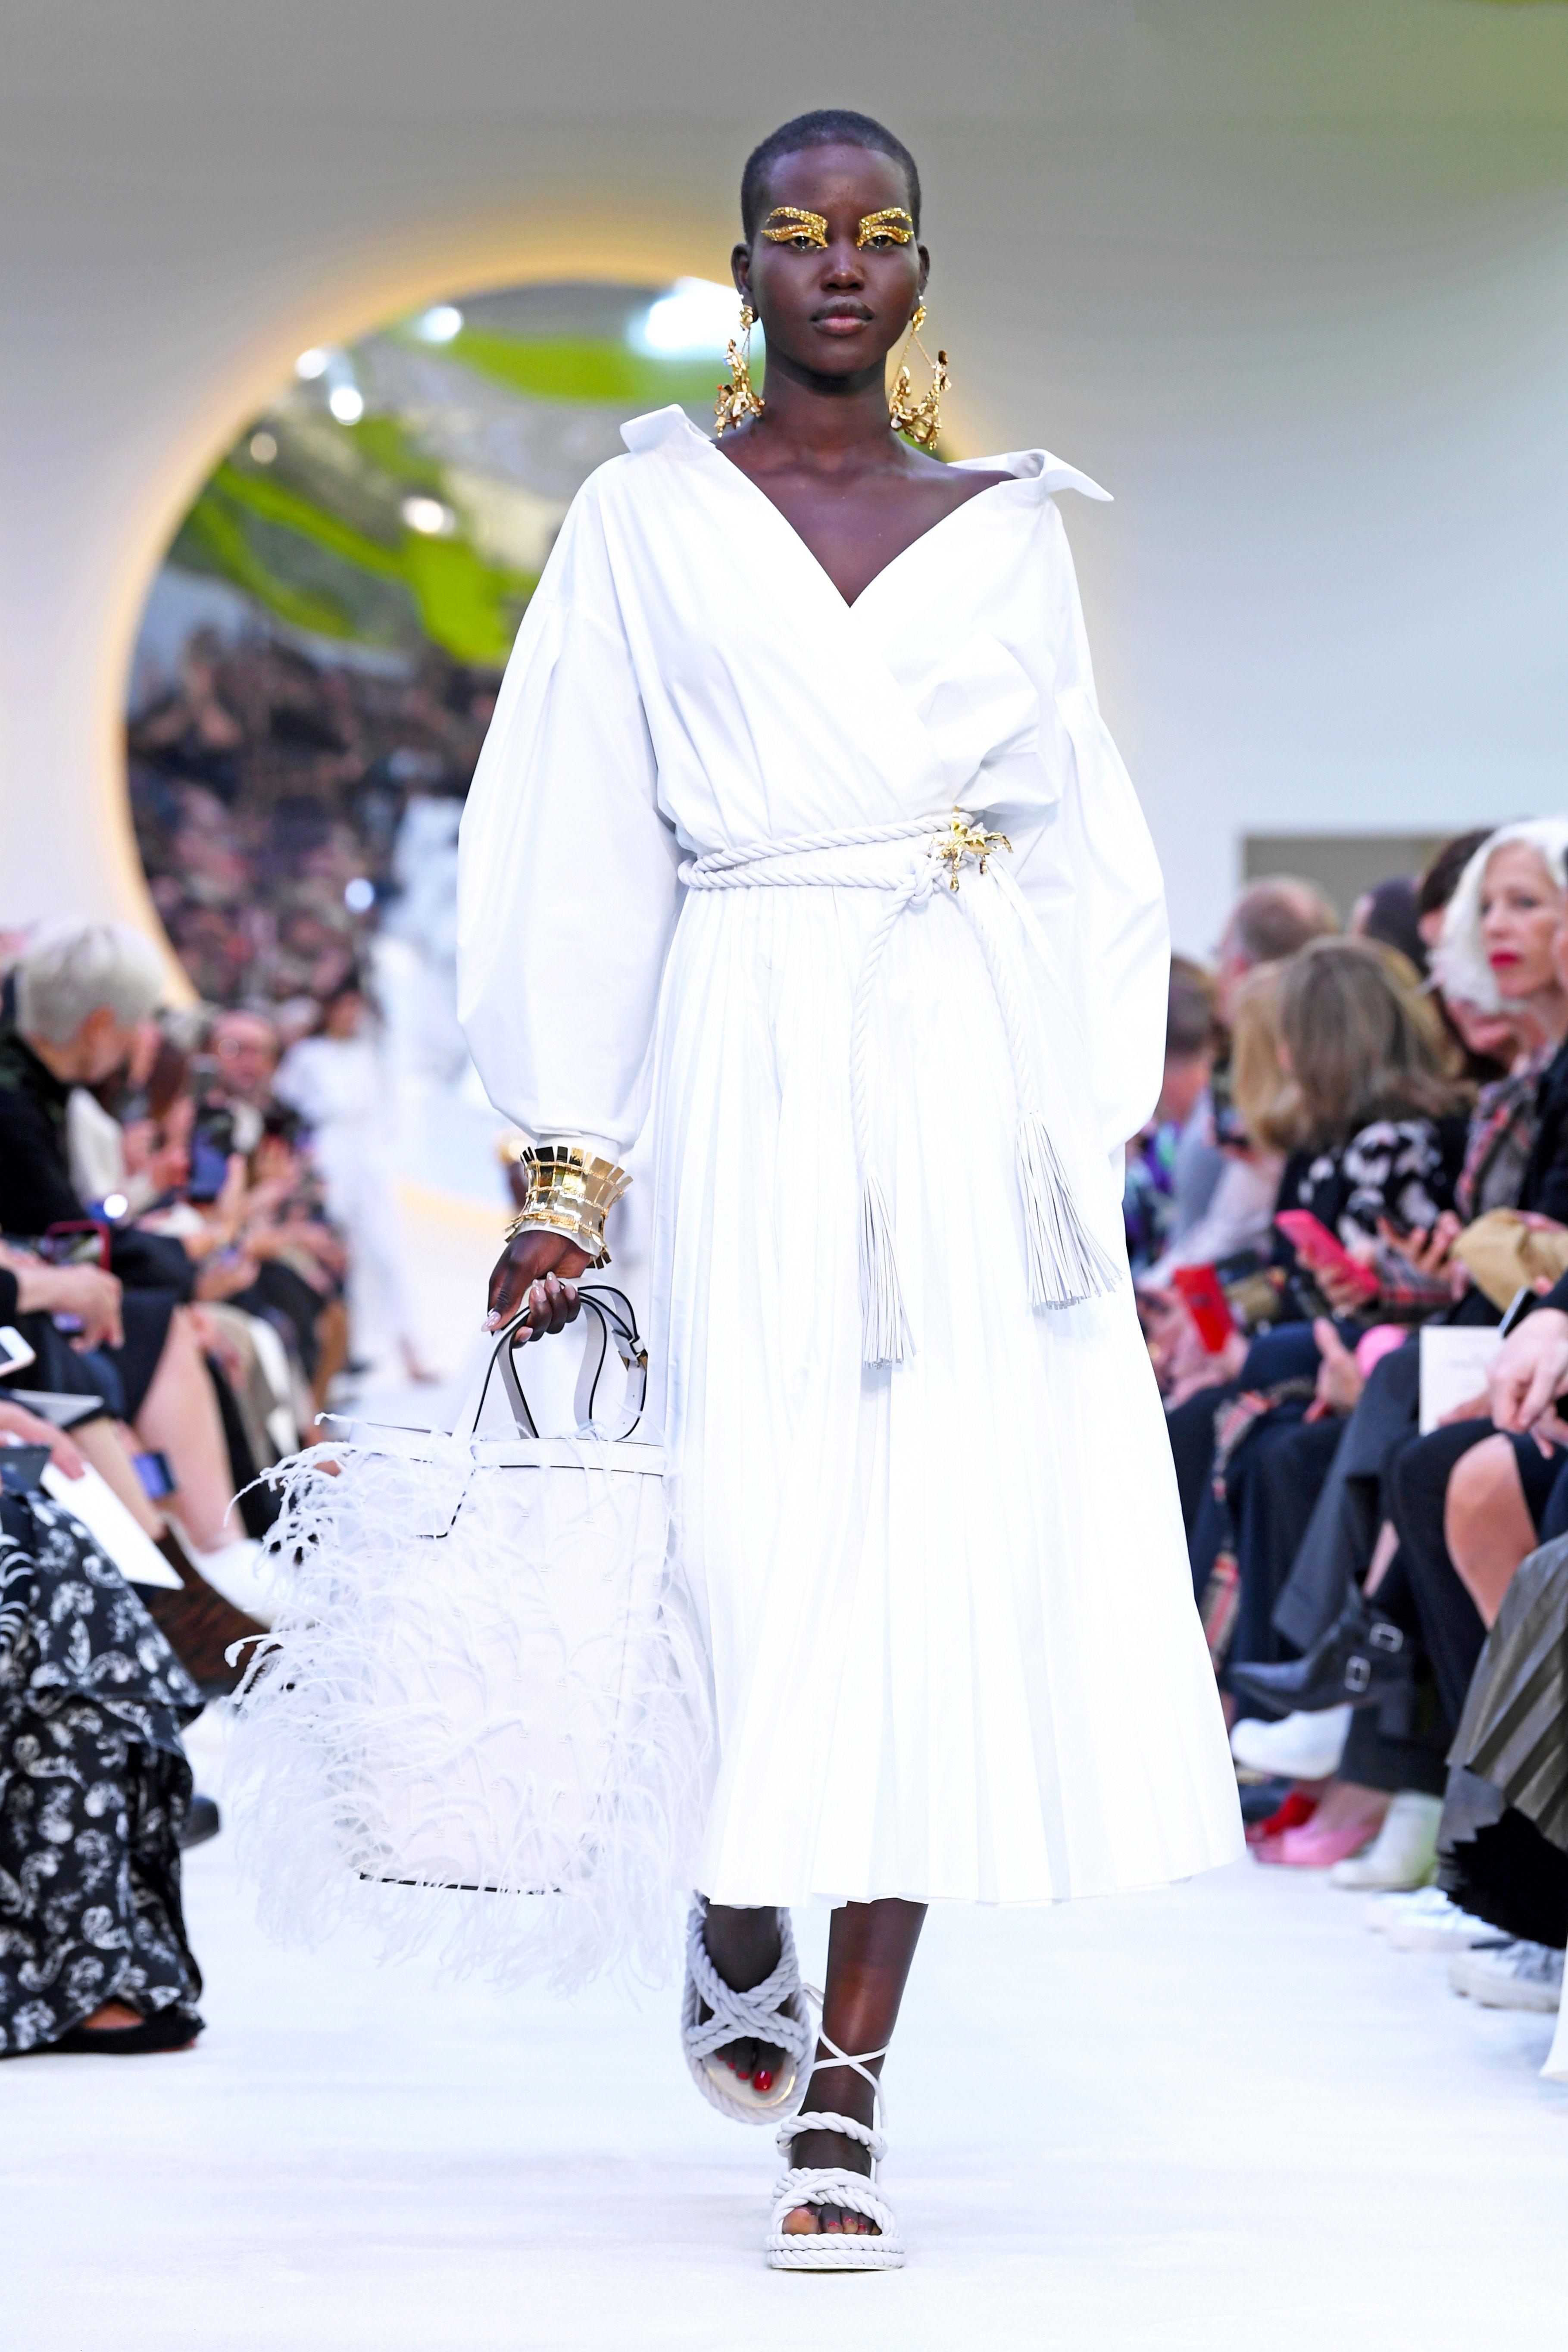 Stream Valentino S Spring Summer 2021 Show How To Watch Milan Fashion Week